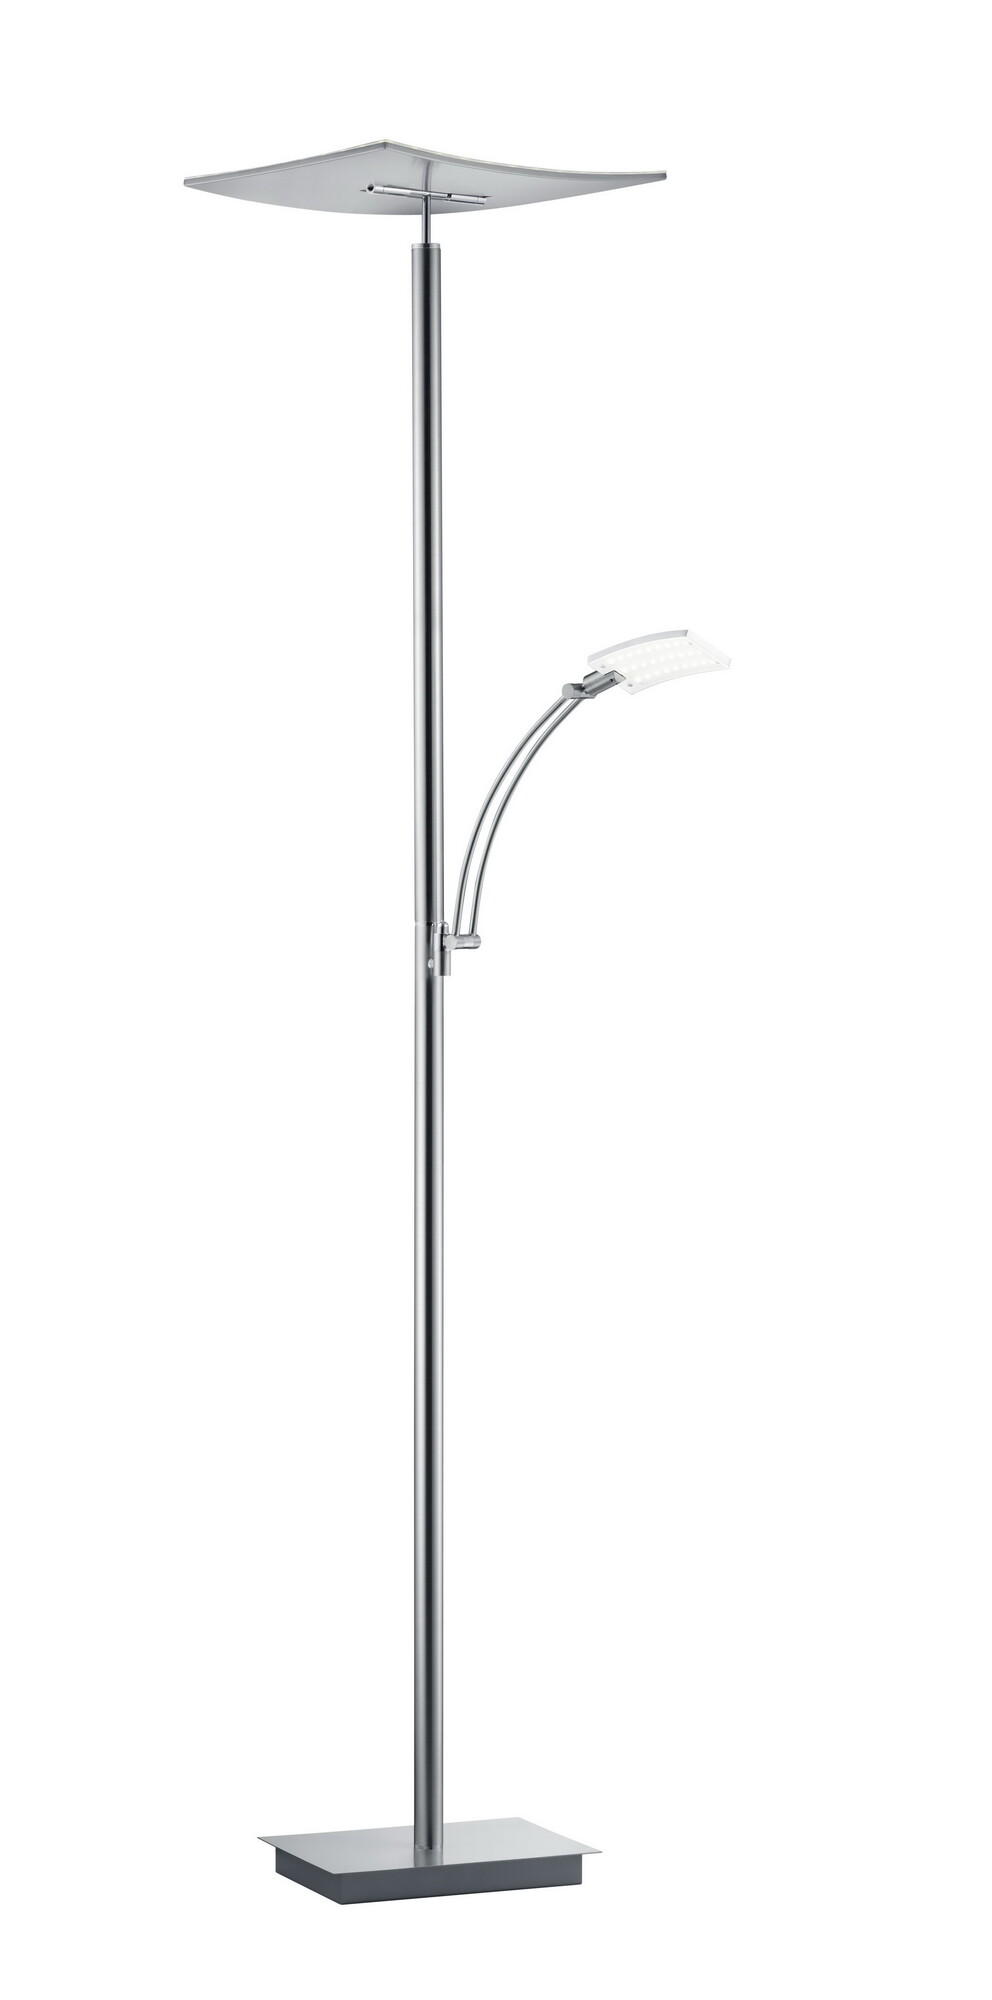 MODENA Vloerlamp LED 2x36W/3500lm Zilver